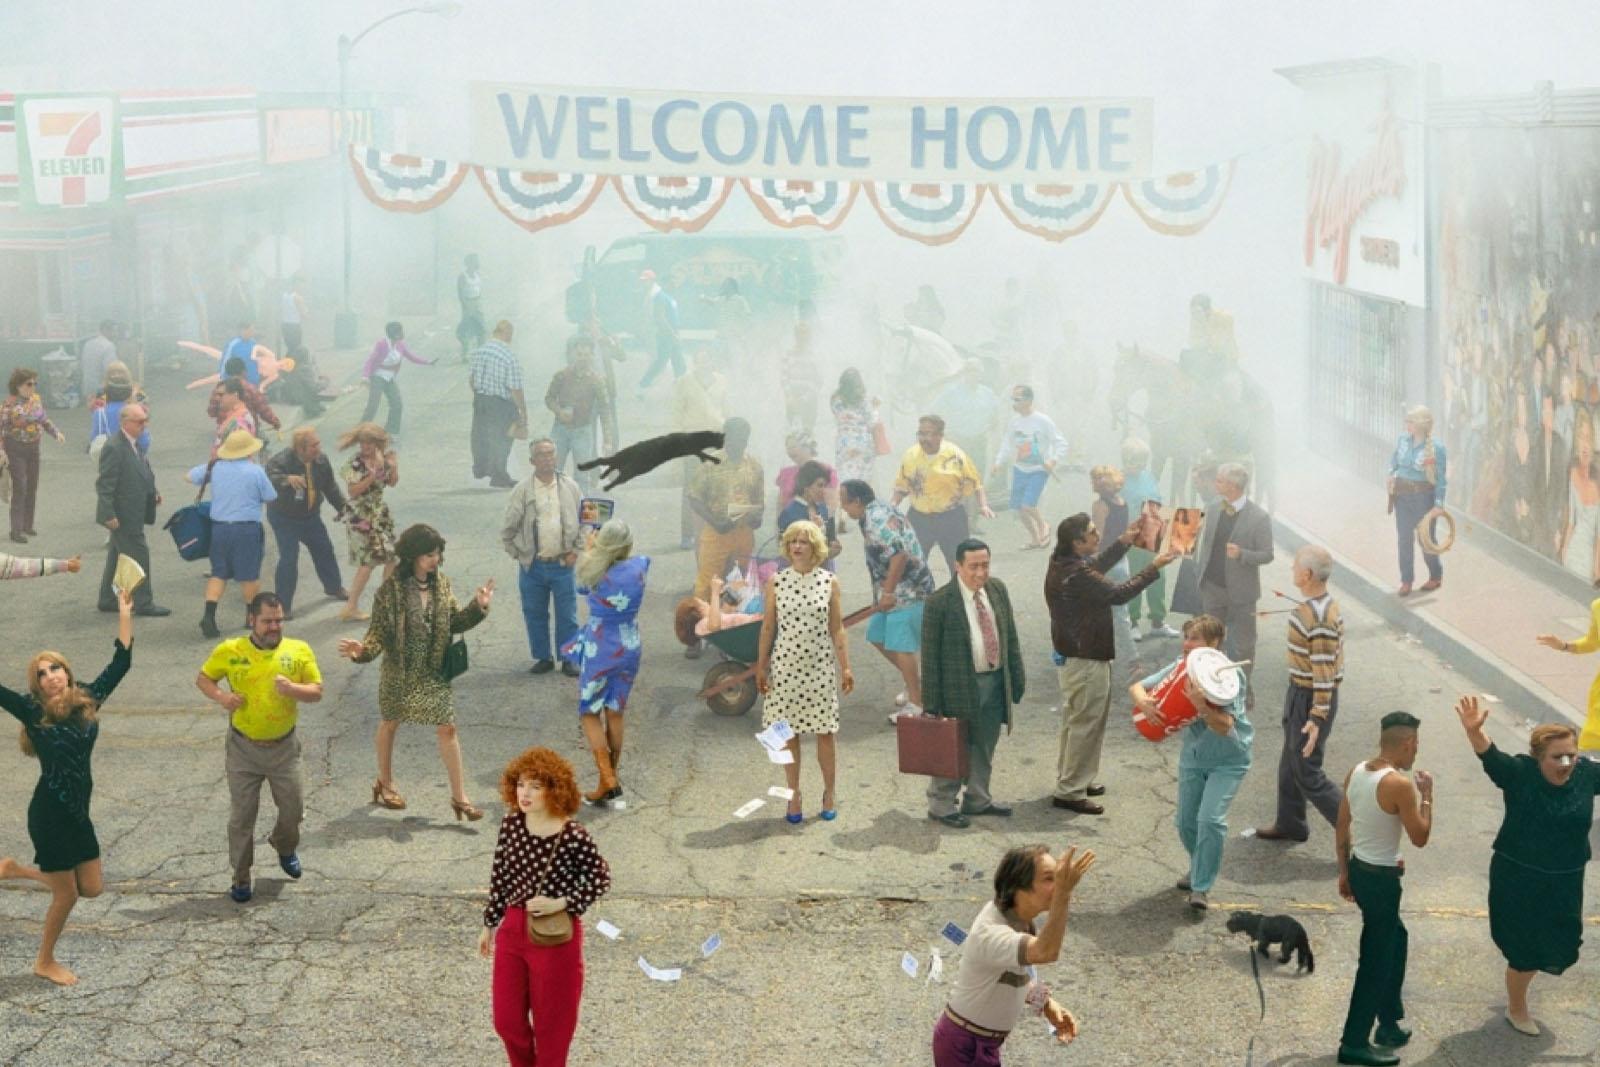 Alex Prager: Welcome Home